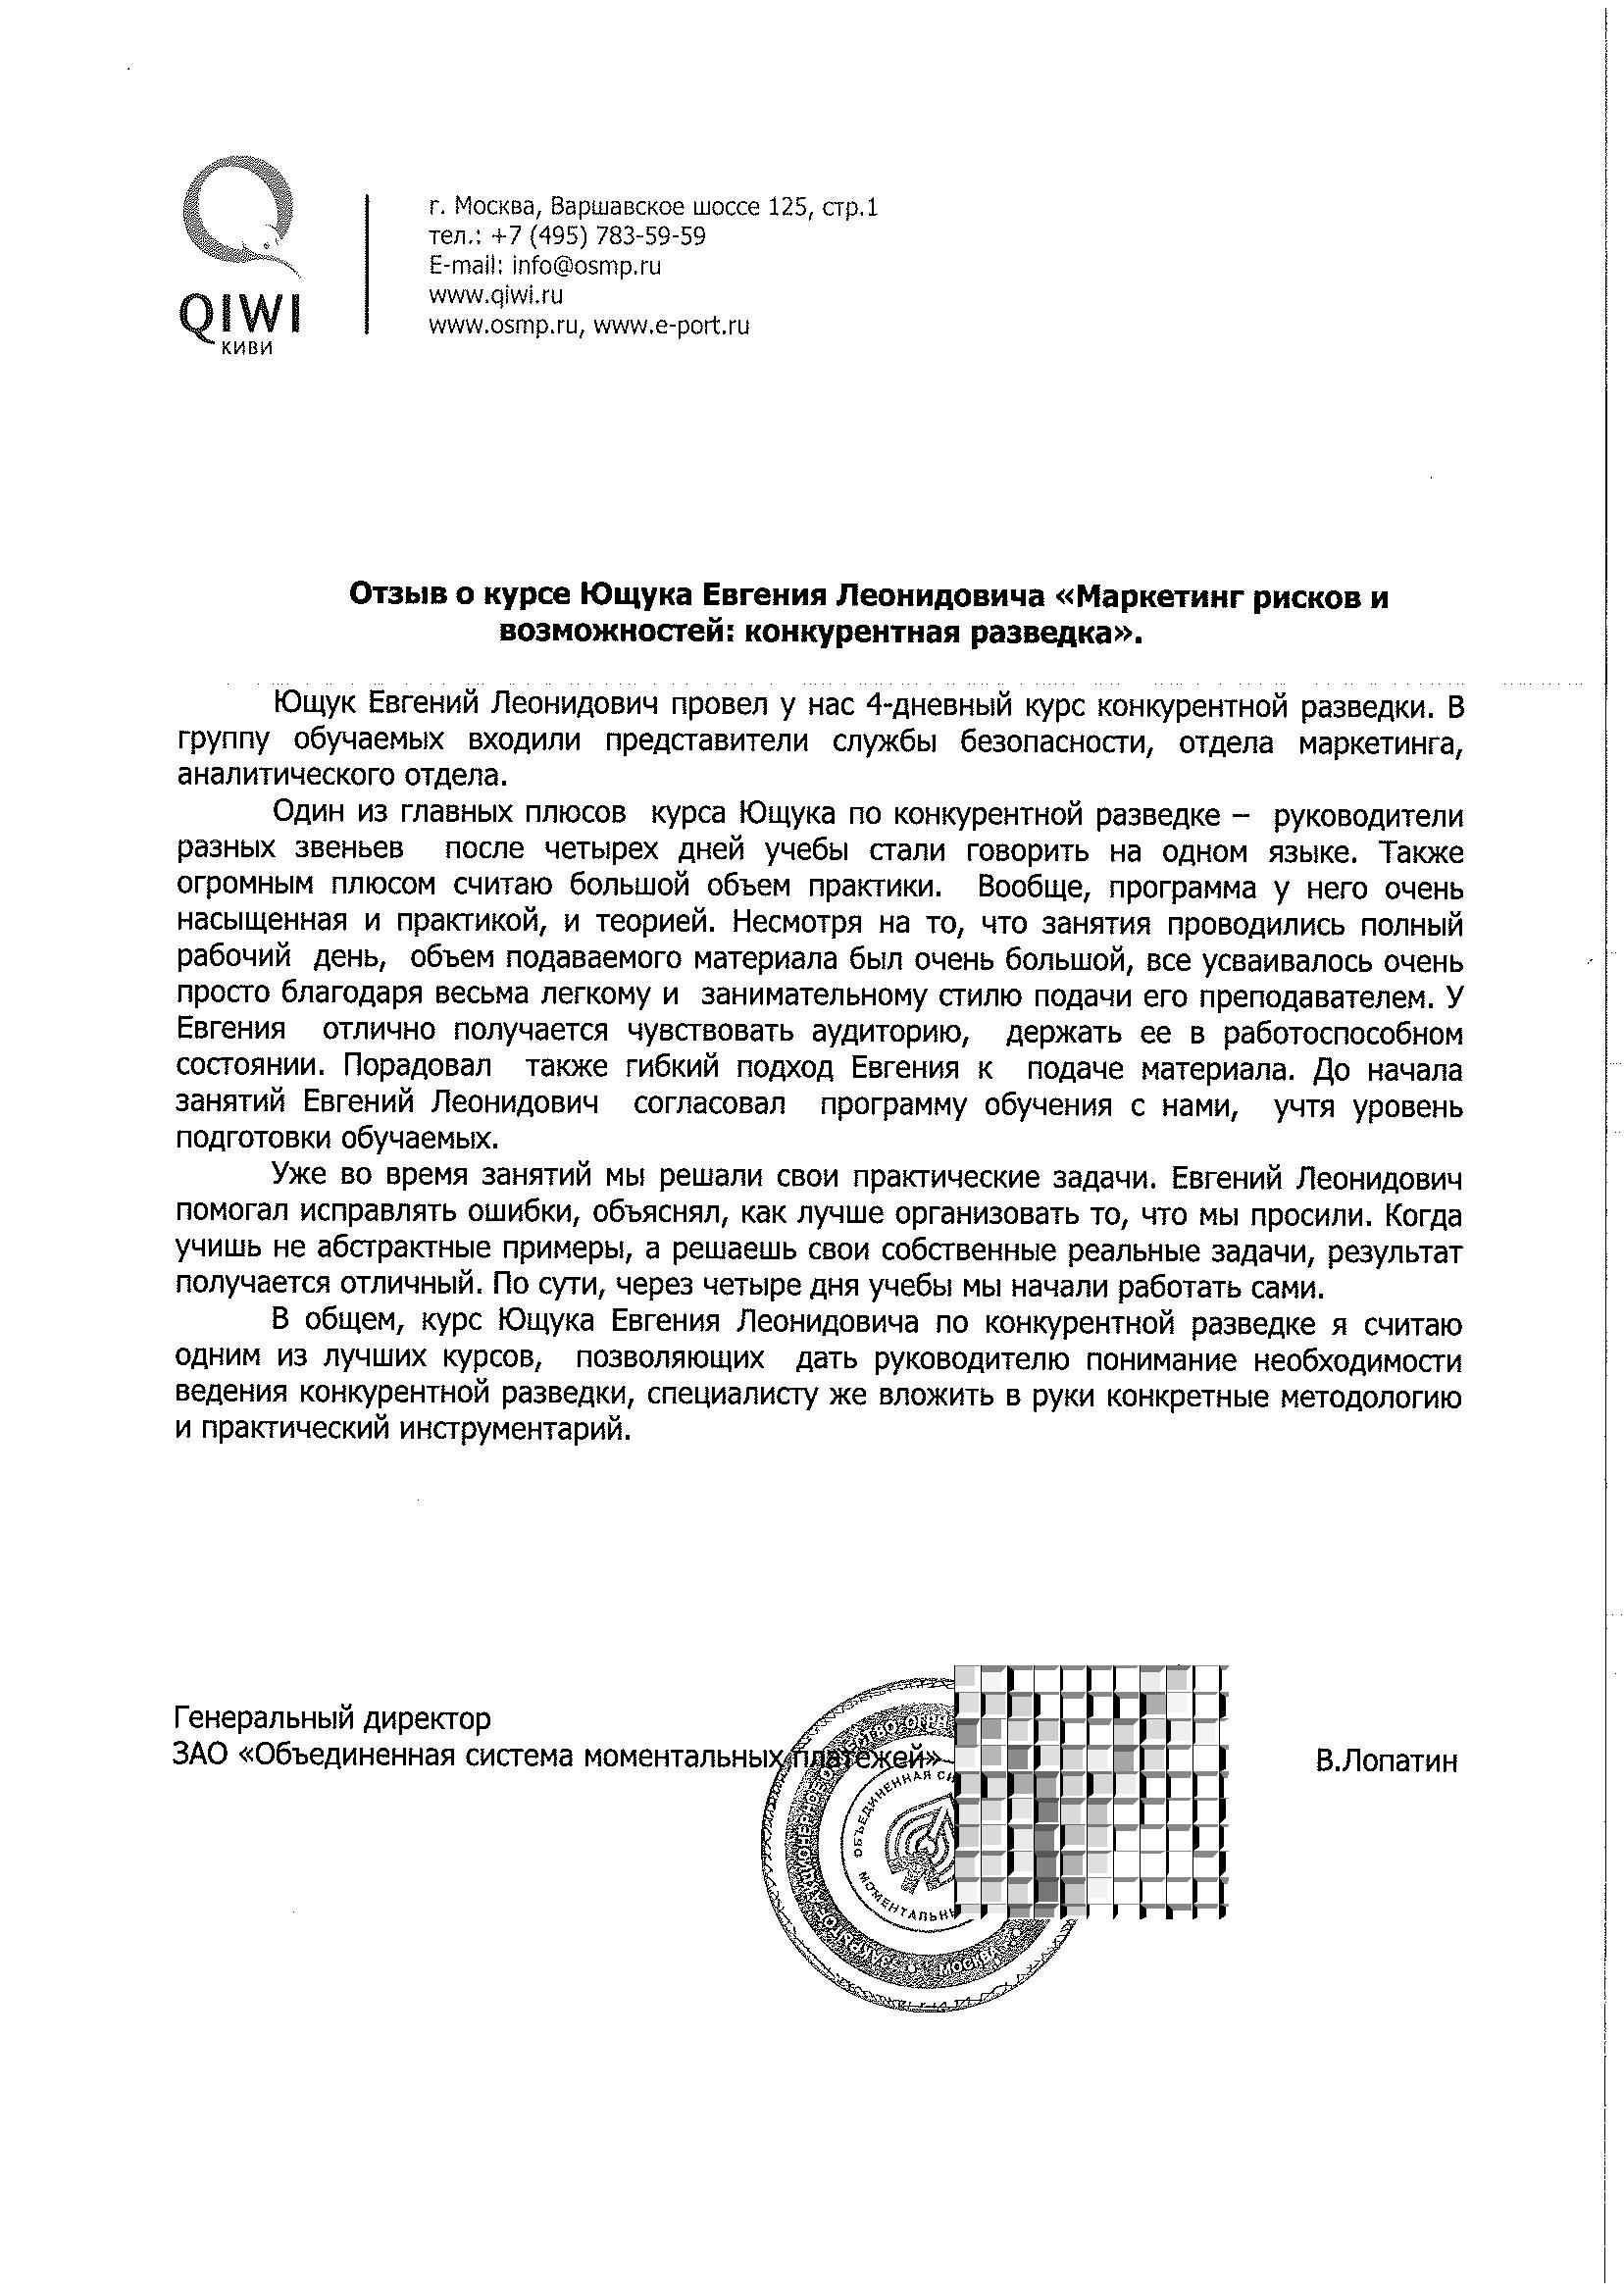 Отзыв на курс Ющука Евгения Леонидовича . Конкурентная разведка.